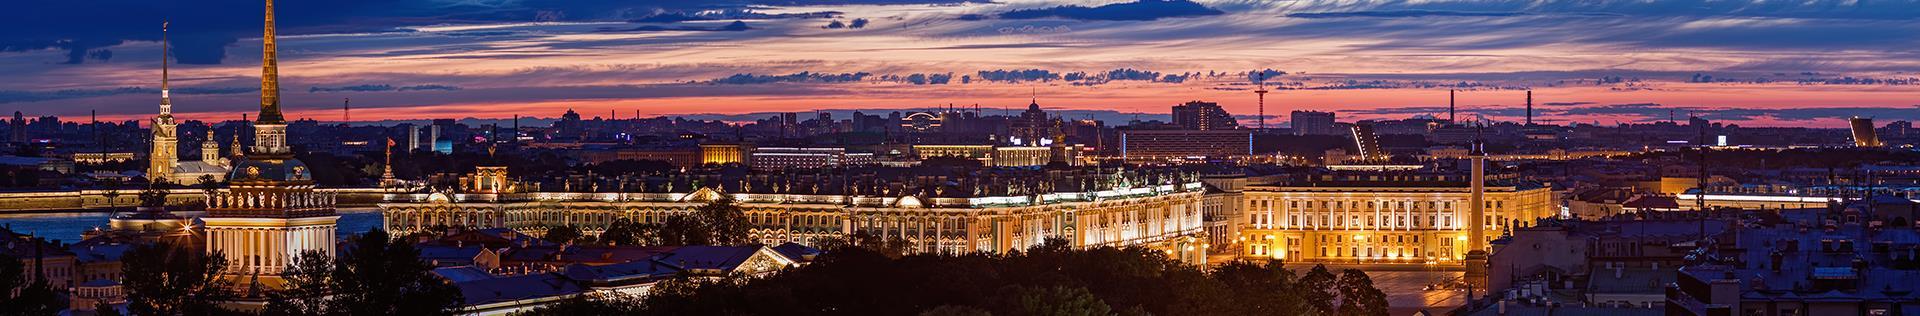 Luvata в Санкт-Петербурге, Россия